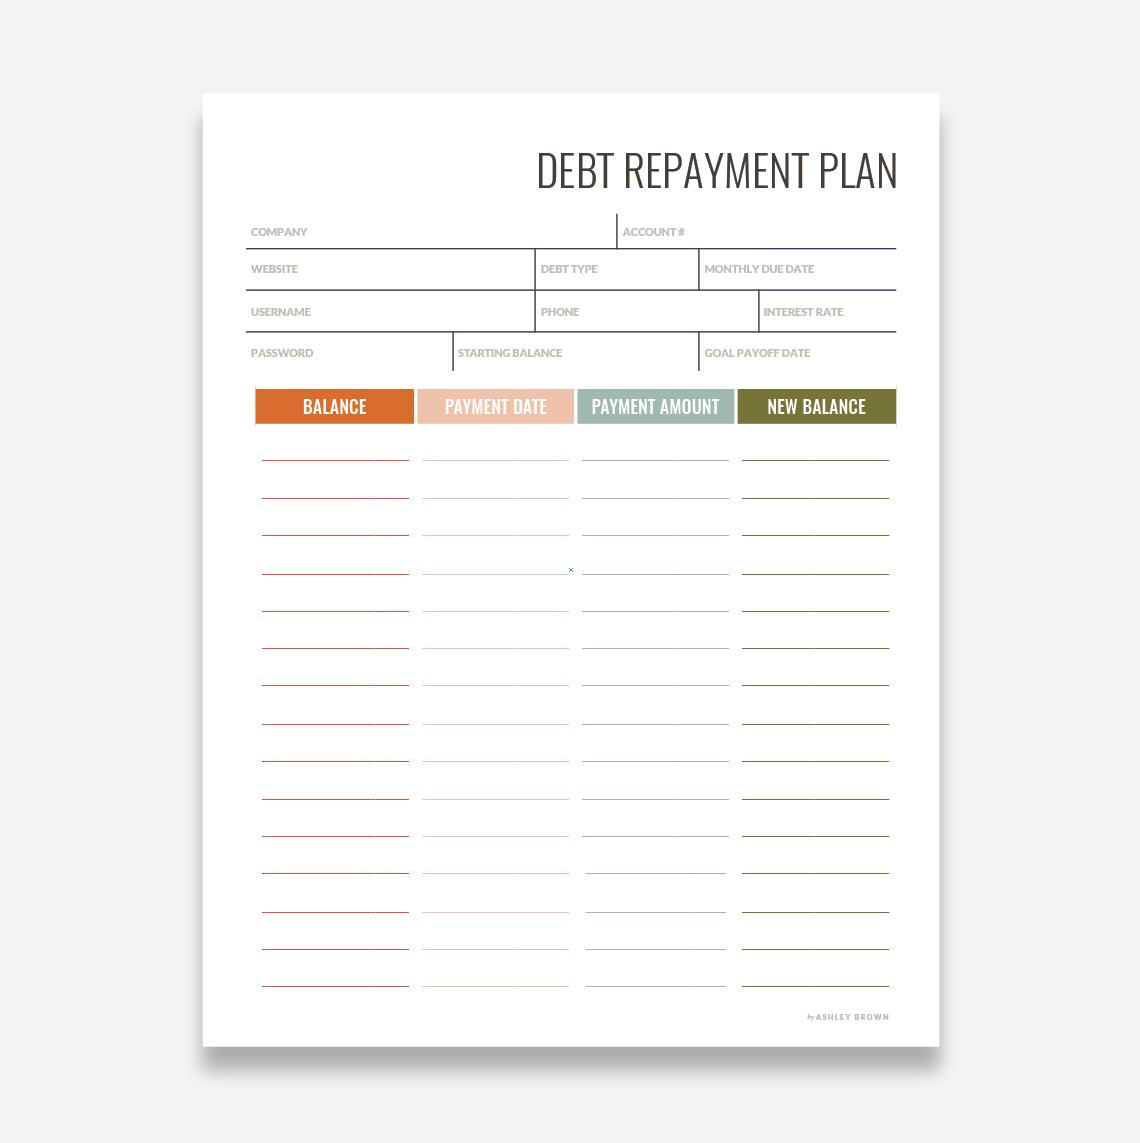 Debt Repayment Worksheet Payment Plan Debt Repayment How To Plan Debt Payoff Plan